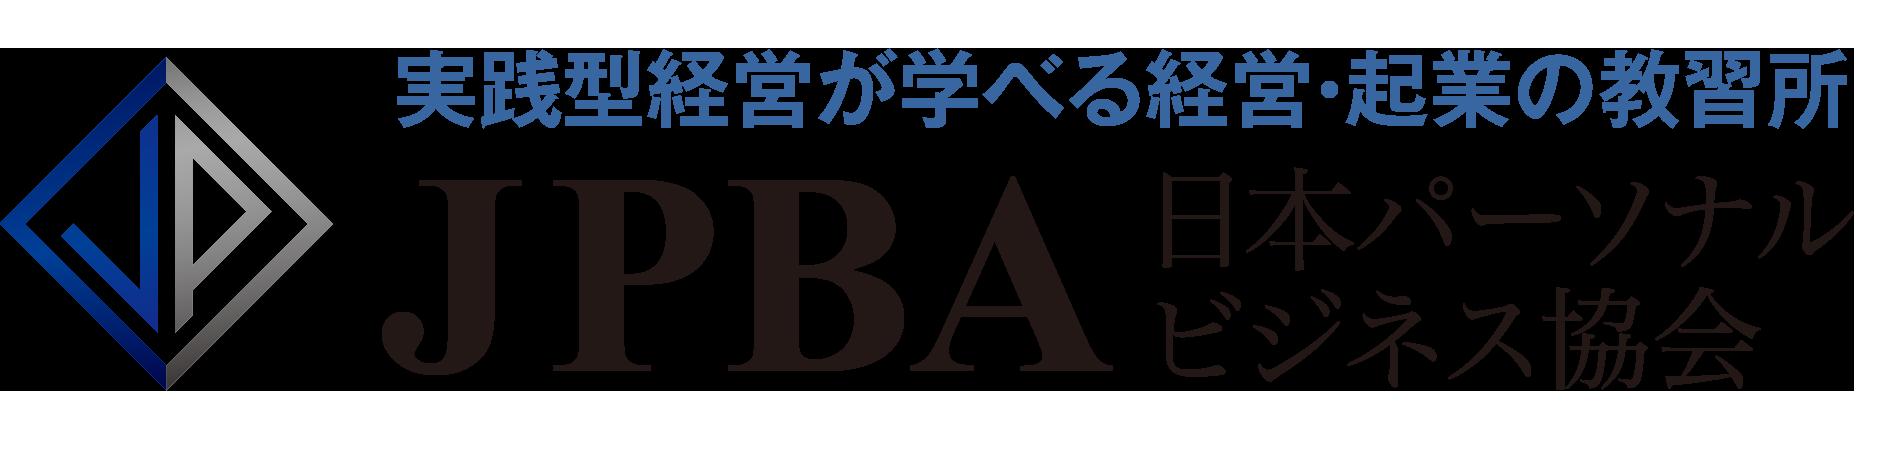 JPBA 一般社団法人 日本パーソナルビジネス協会 業務のオンライン化・テレワーク時代の人材育成・オンライン集客などアフターコロナ時代に対応する会社・事業者・社員の経営力アップを支援!